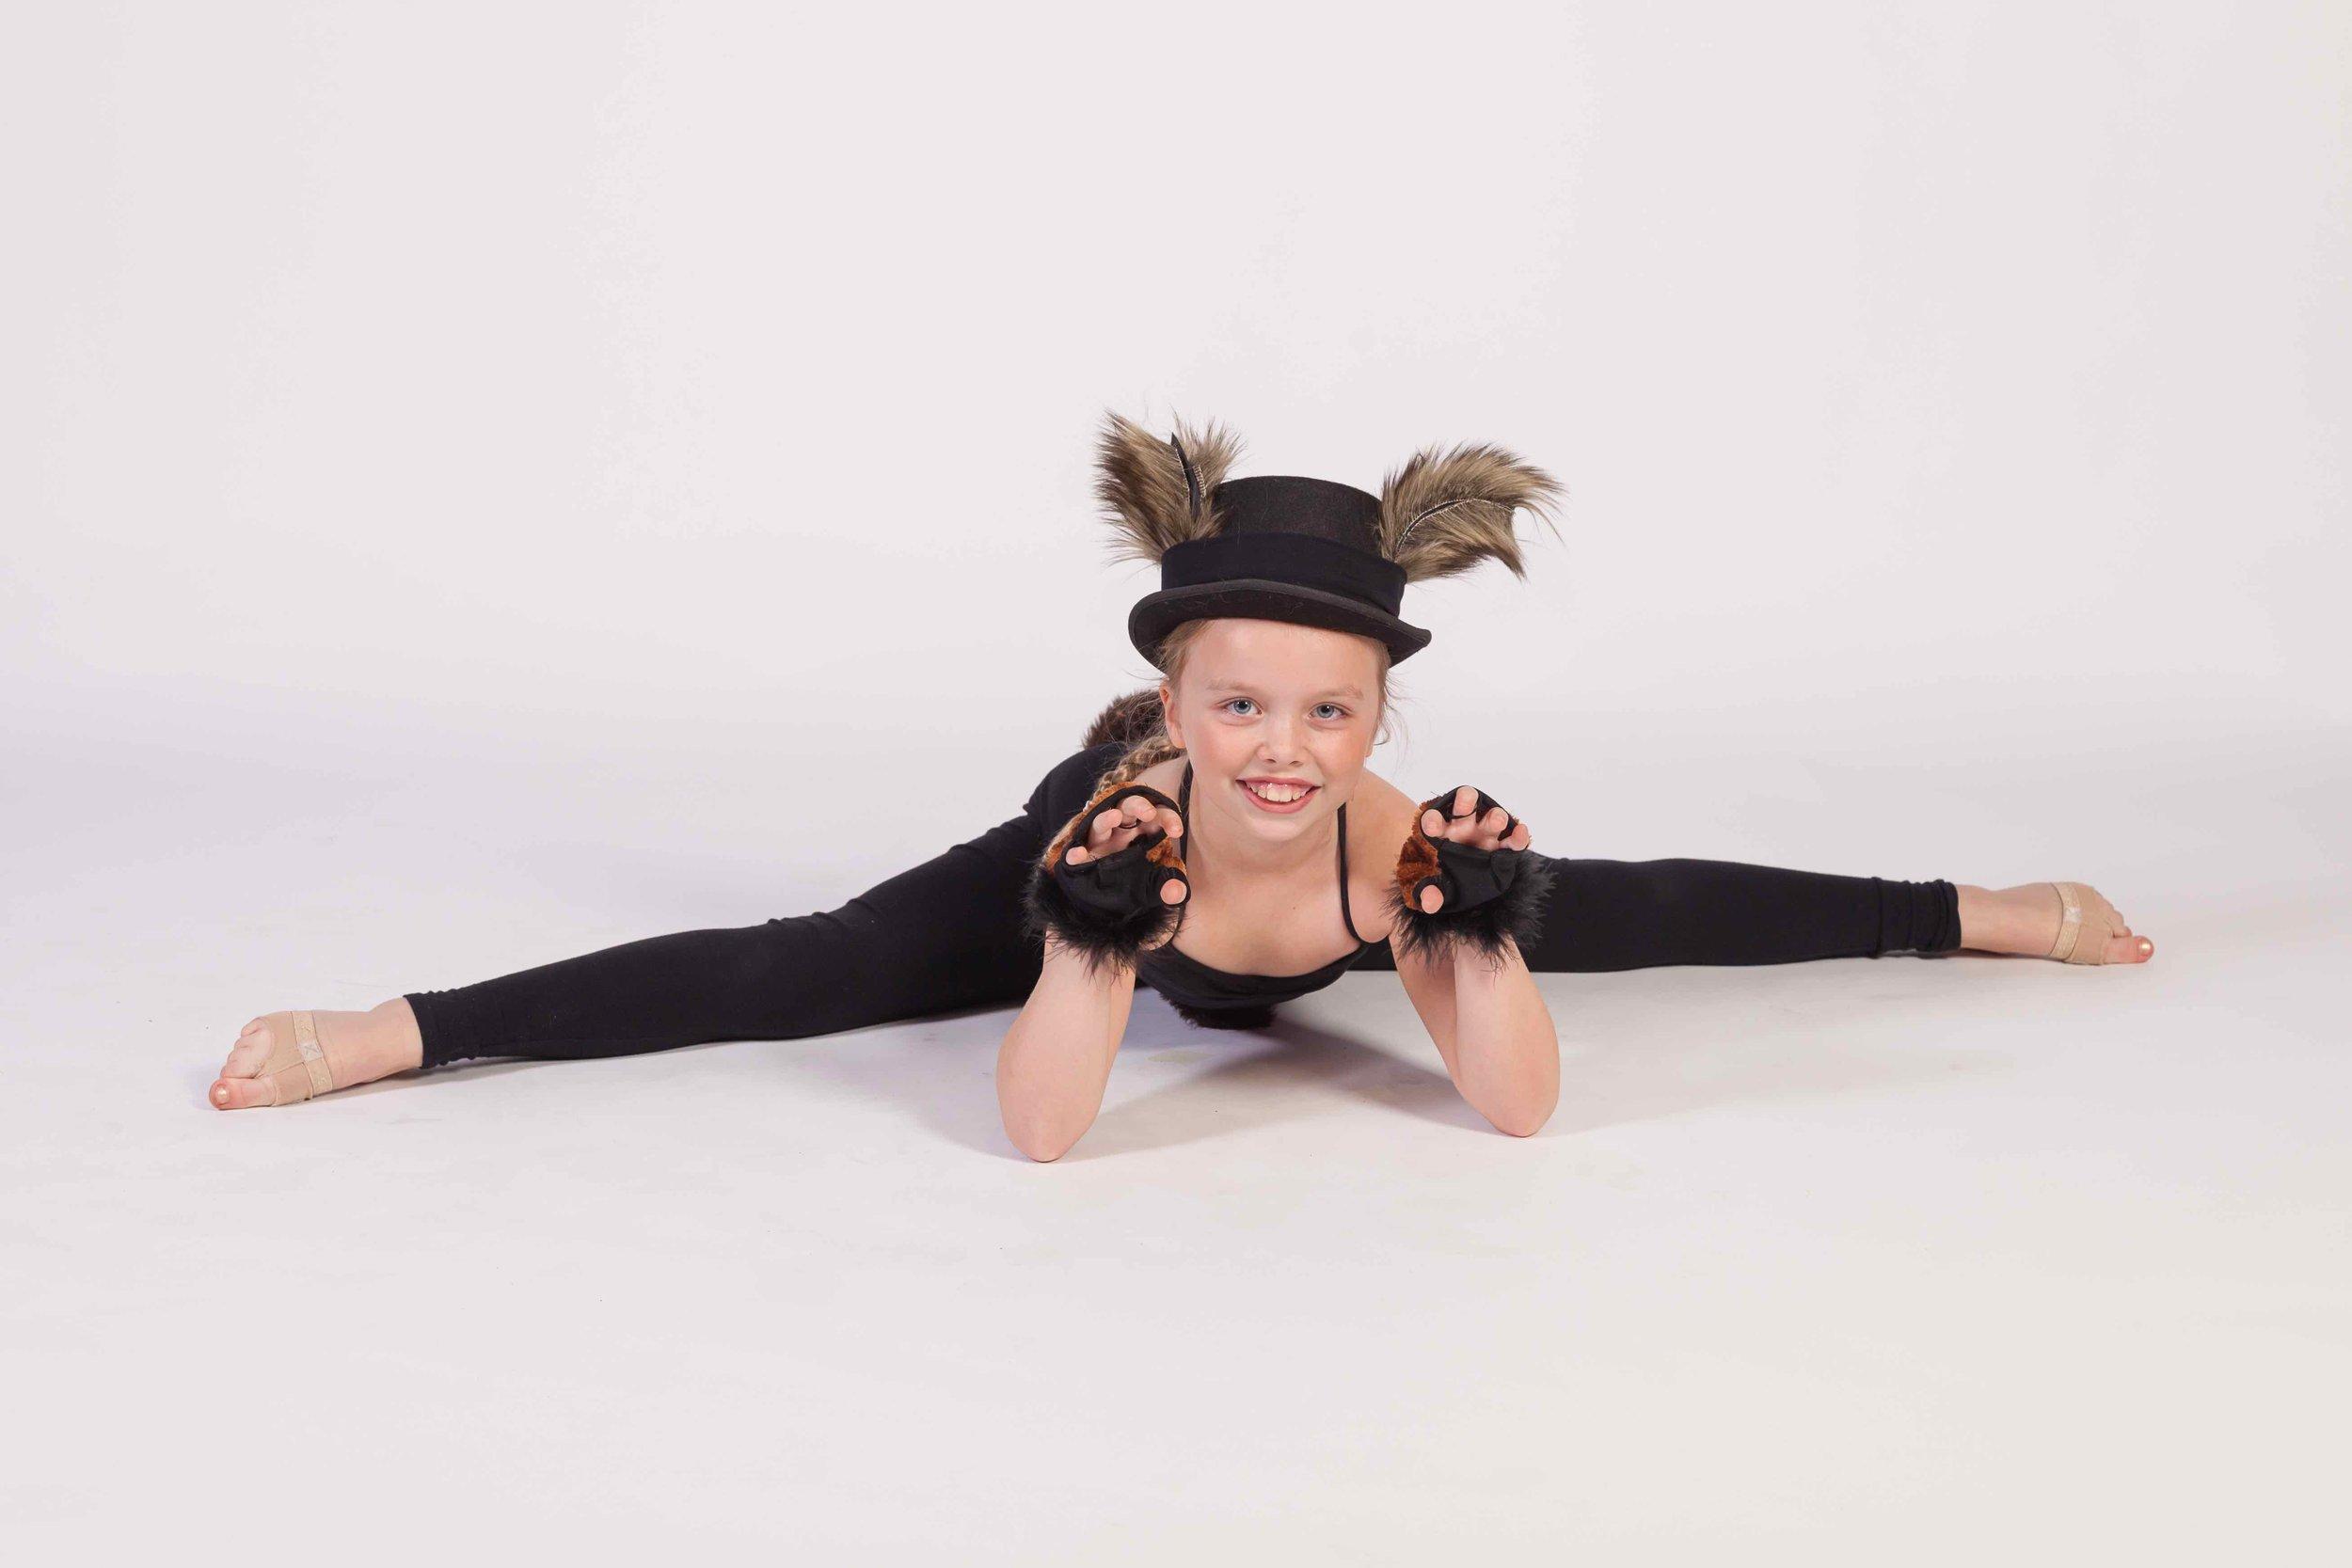 Dancer from Pointe Works Showcase